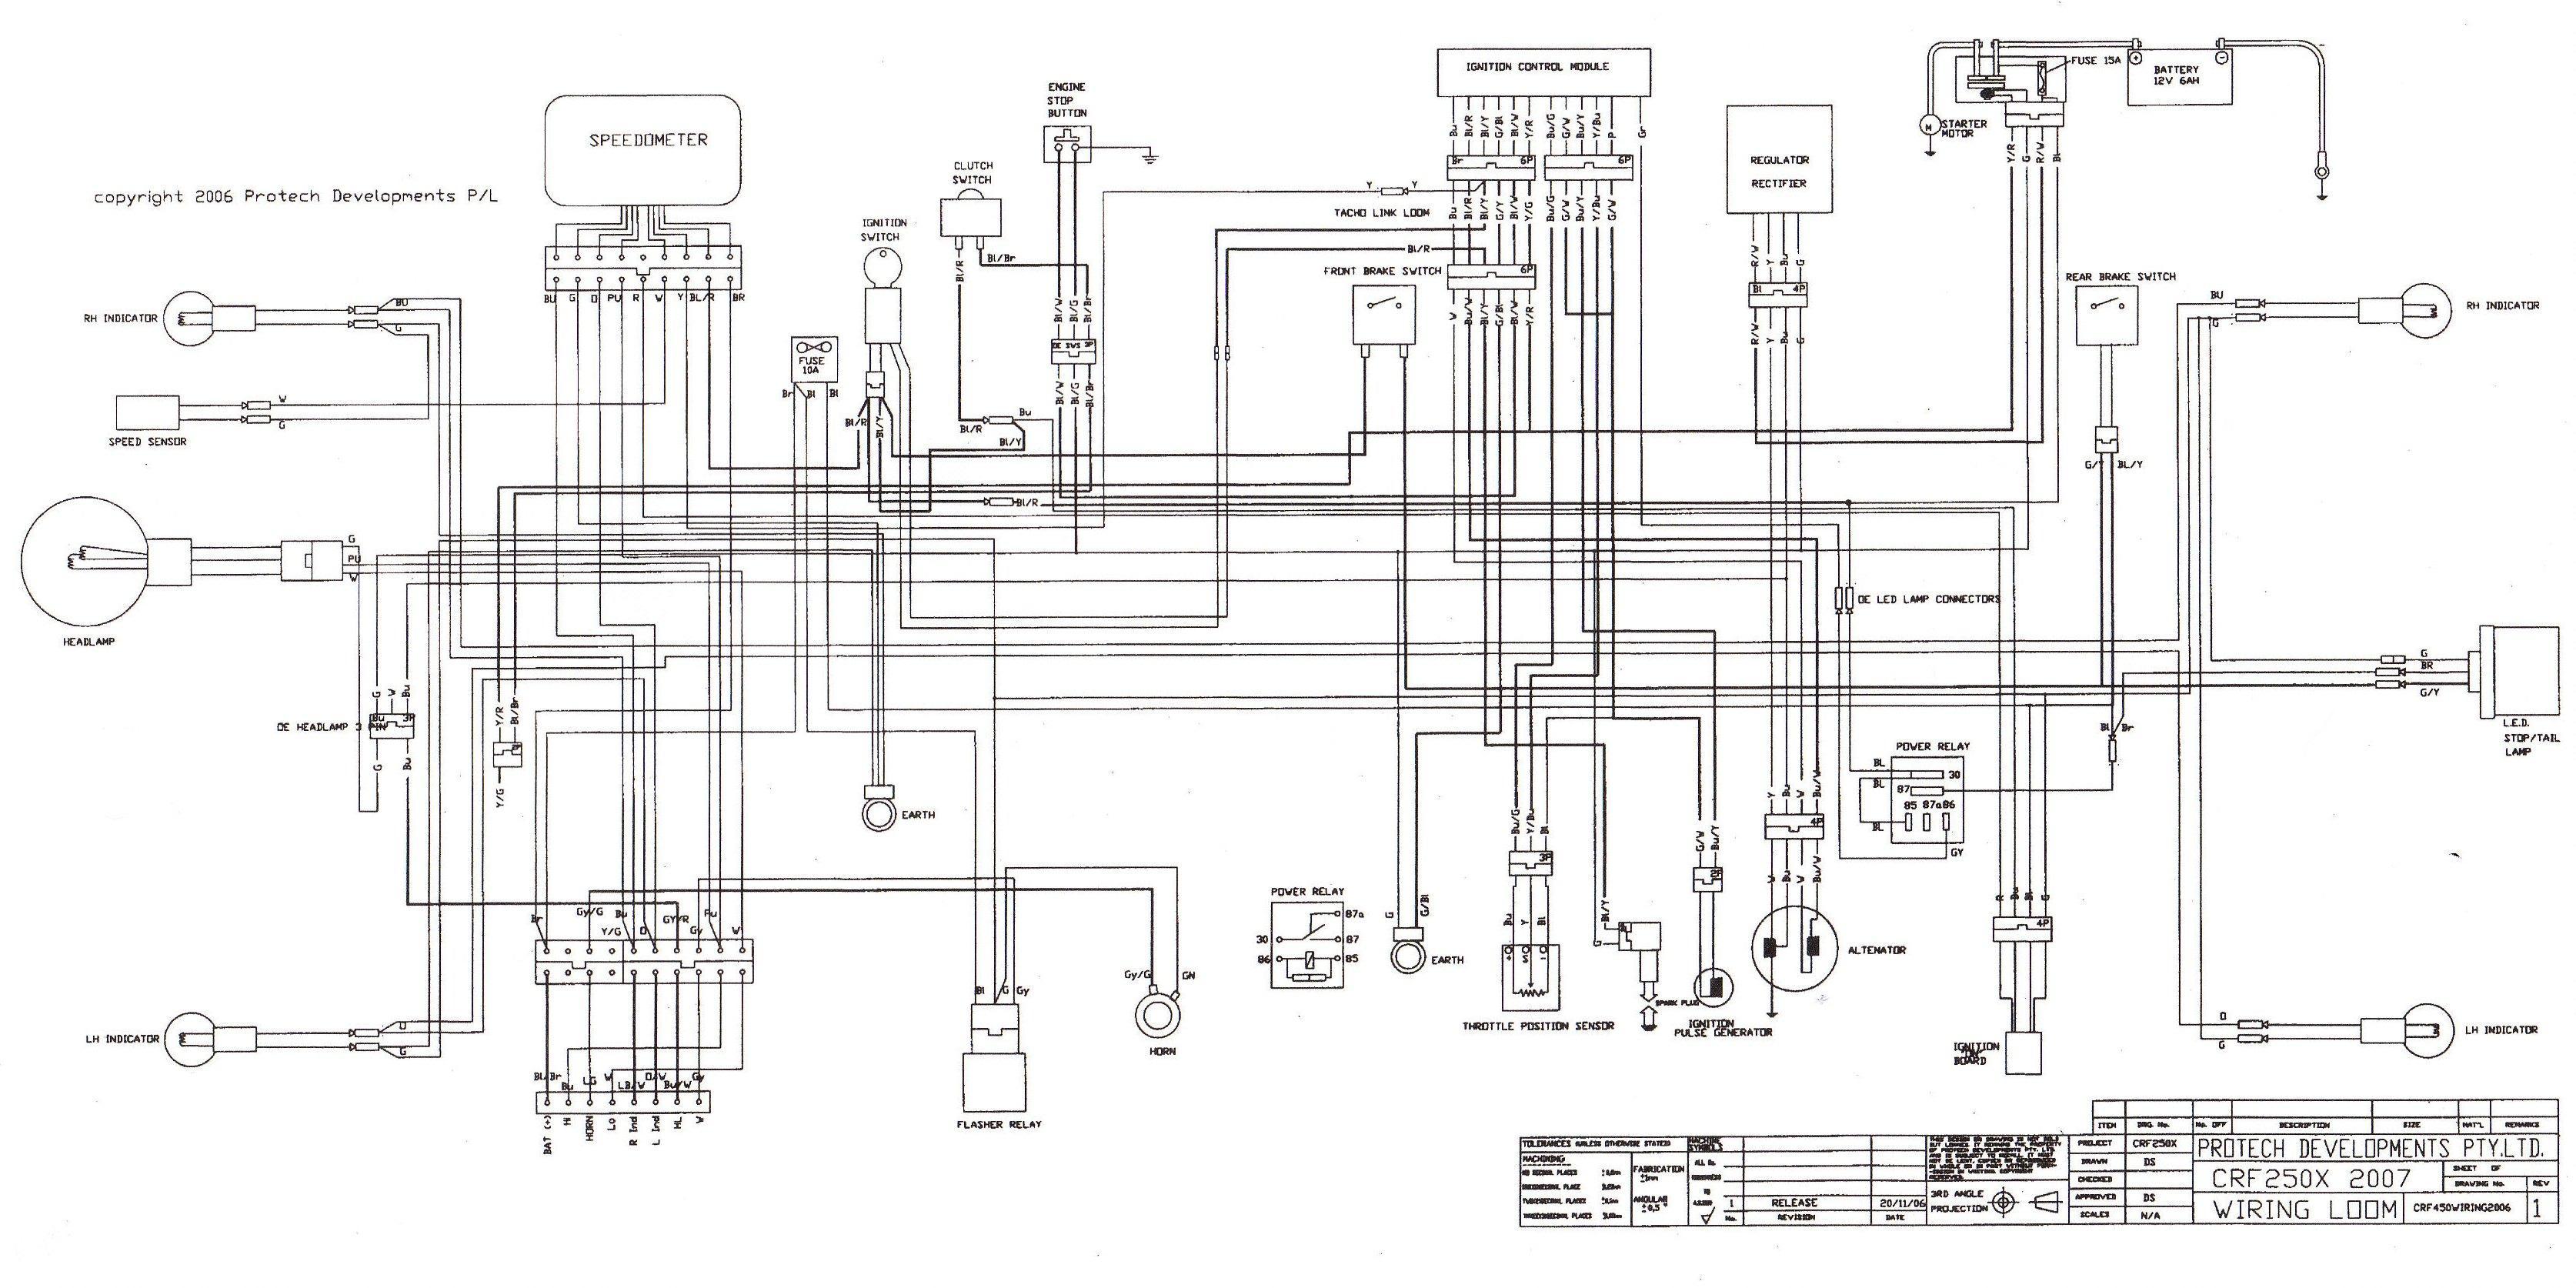 crf230l wiring diagram ge 1456  wiring diagram dirt bike wiring diagram 2015 crf450x  dirt bike wiring diagram 2015 crf450x